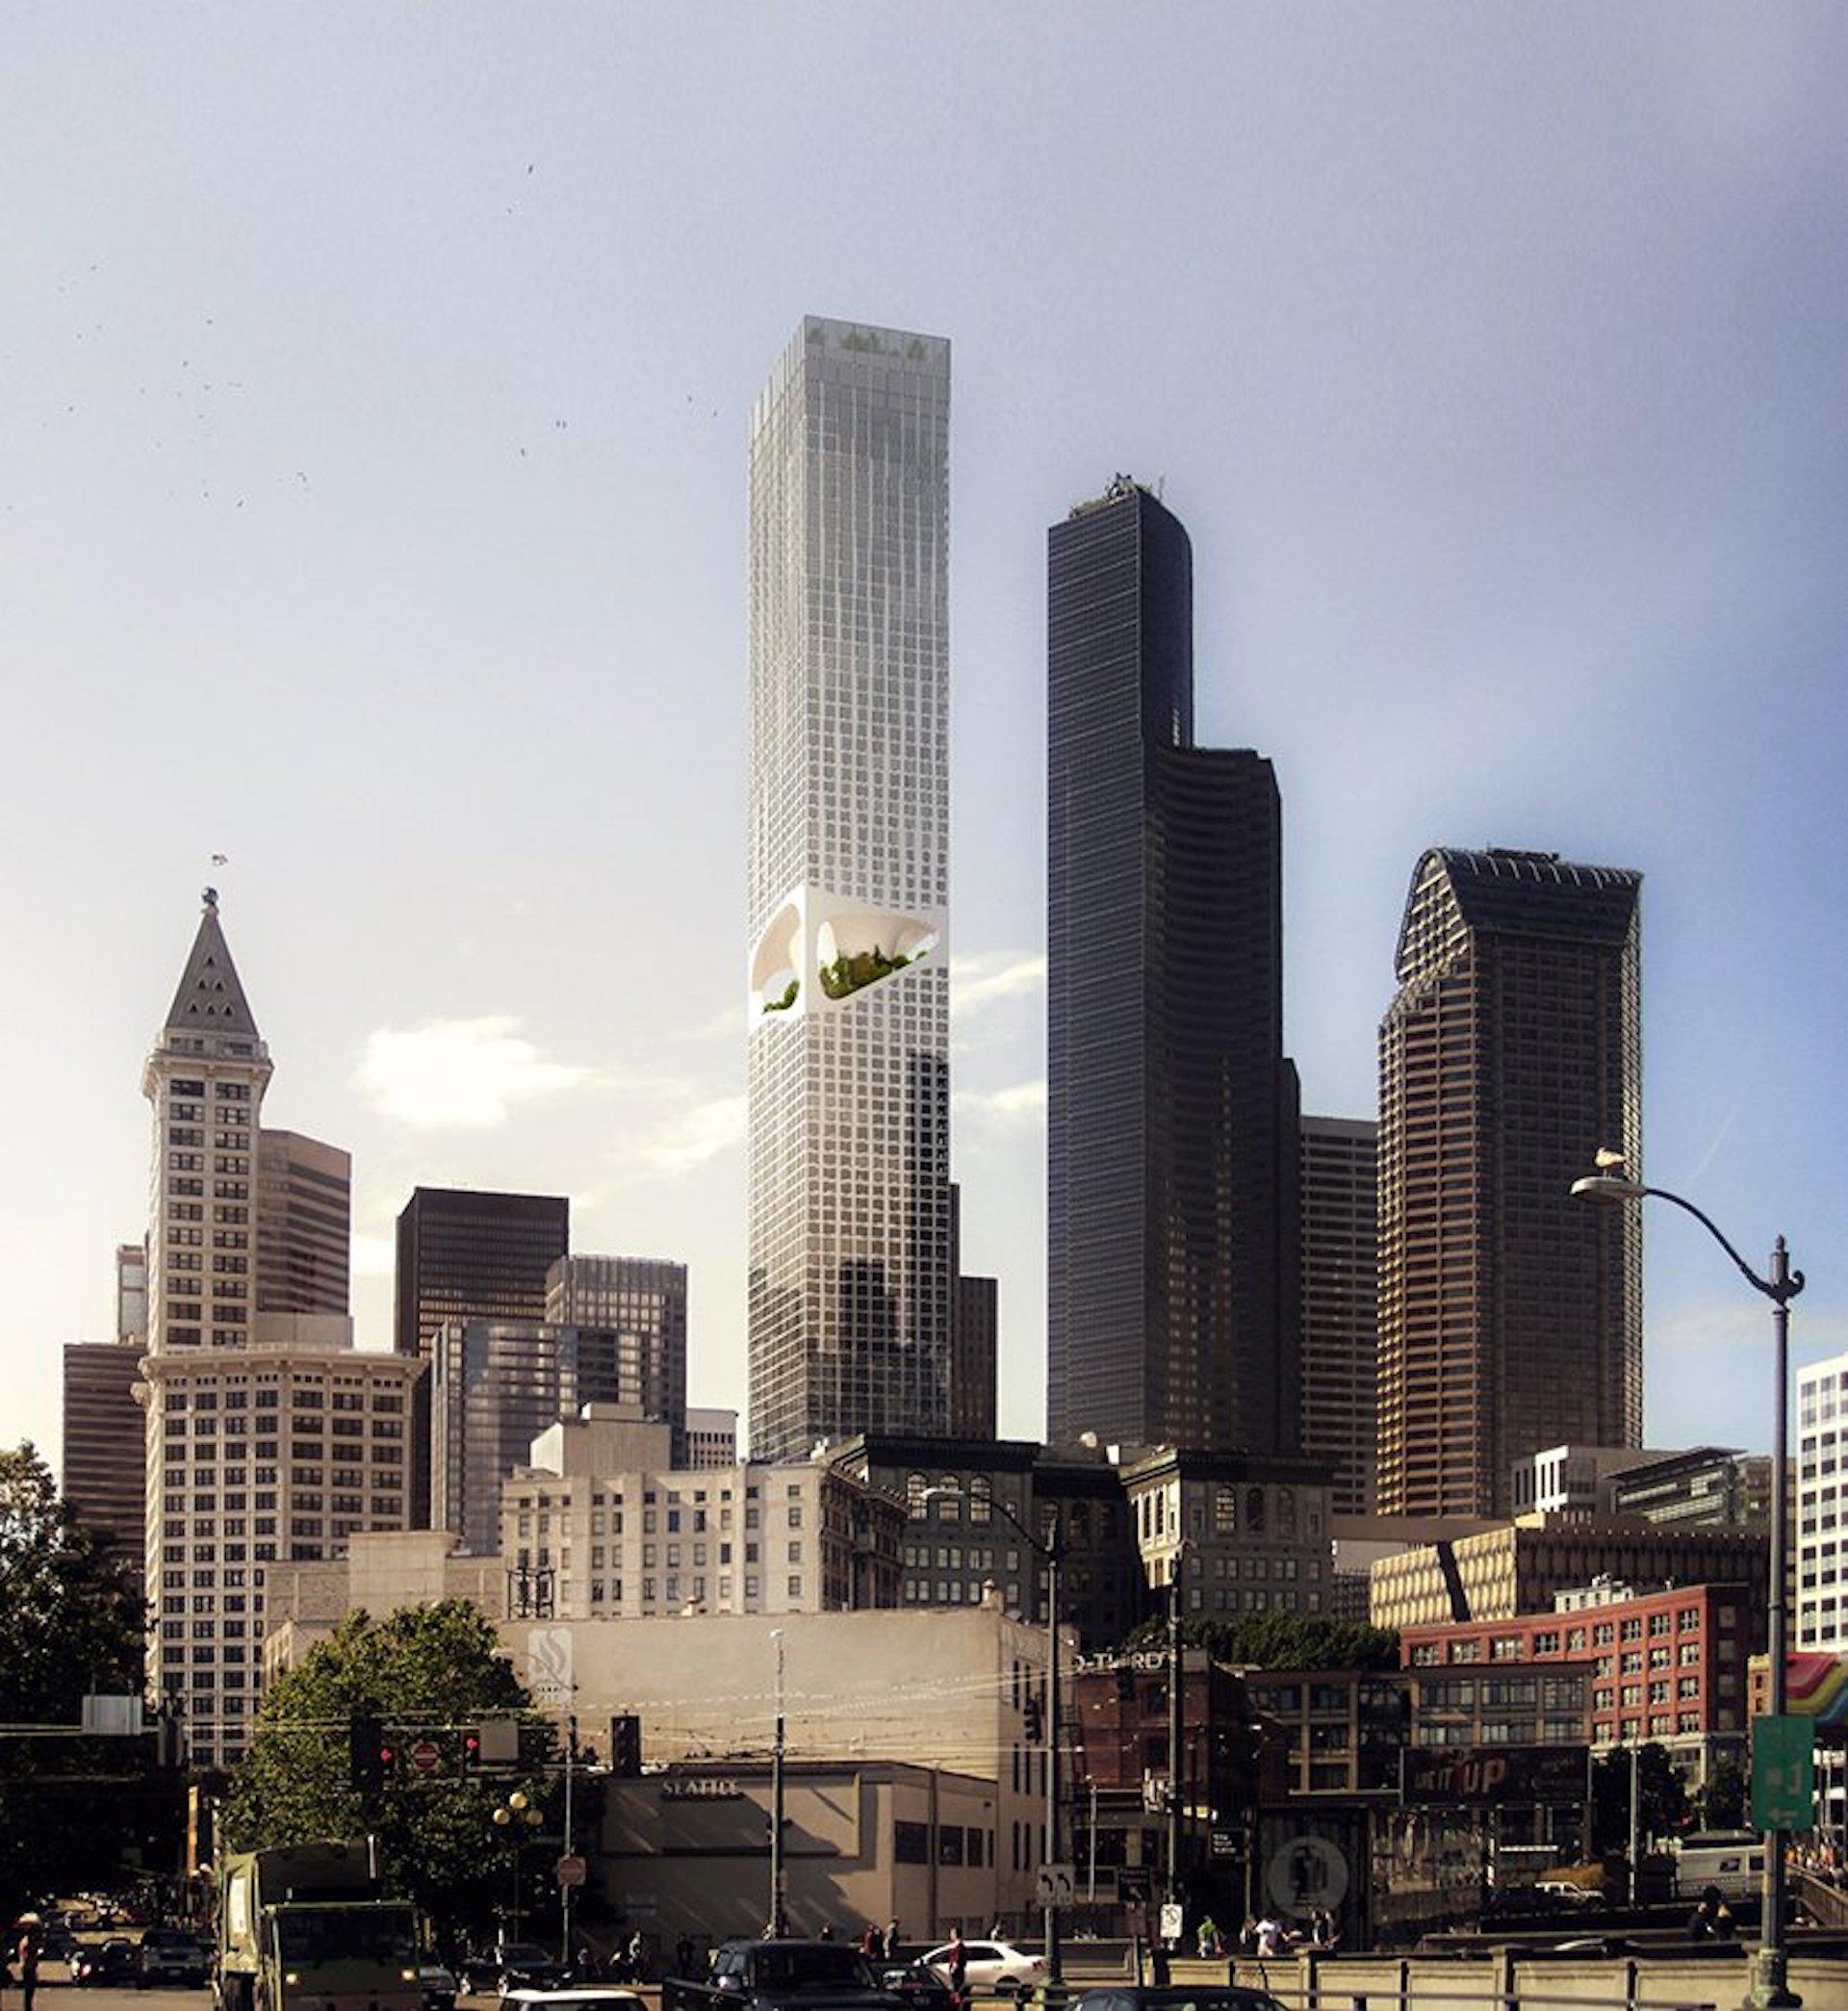 Seattle Tower: un fantástico rascacielos con un parque central